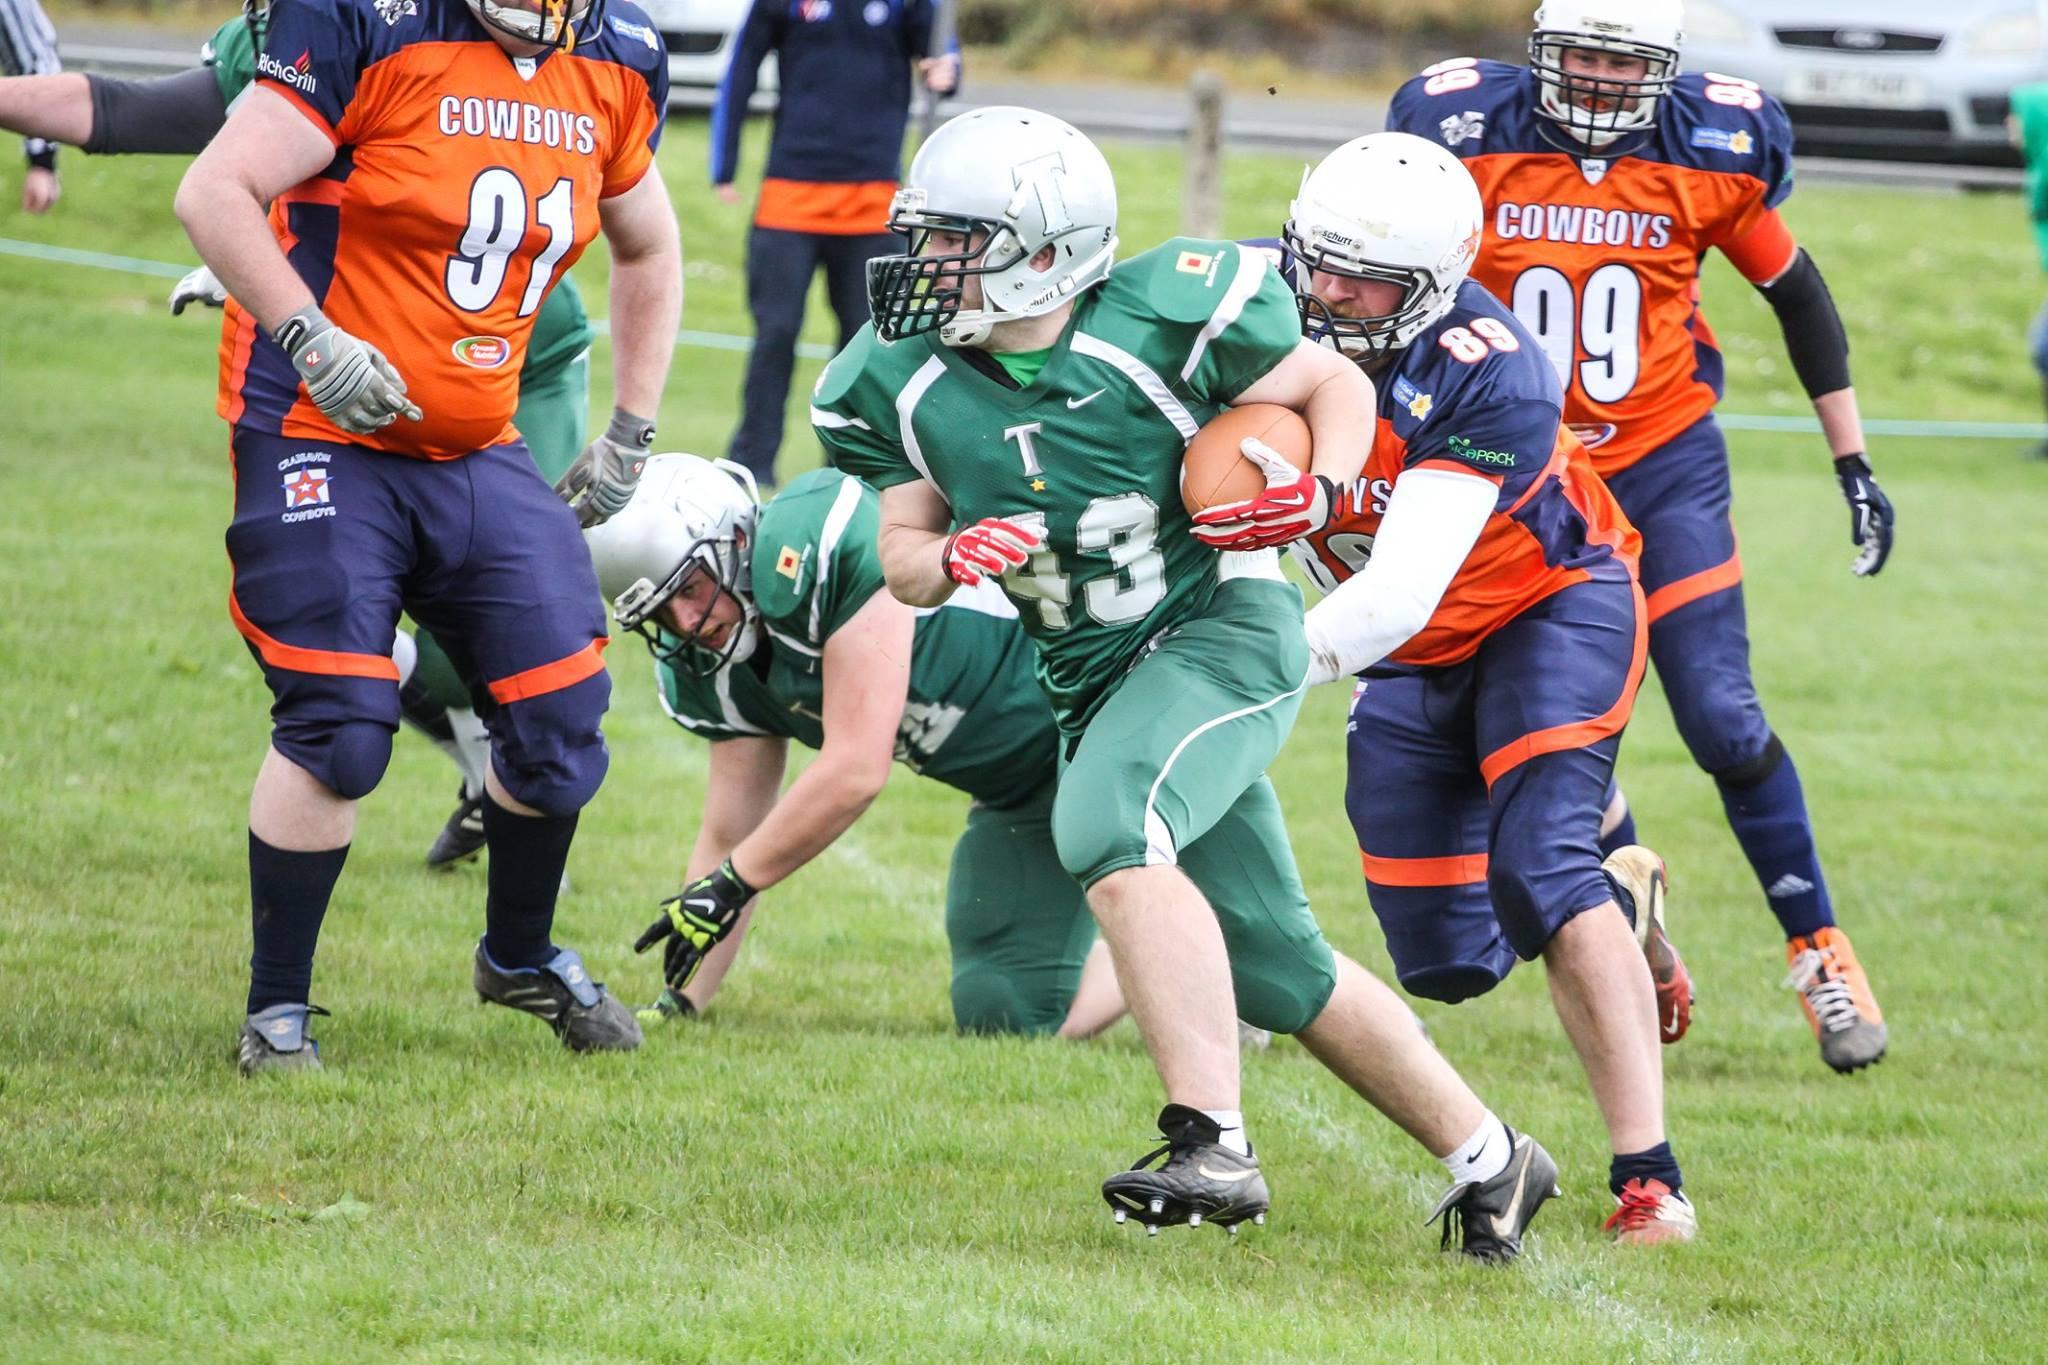 Craigavon Cowboys vs Belfast Trojans 2015 - foto Pixlmedia